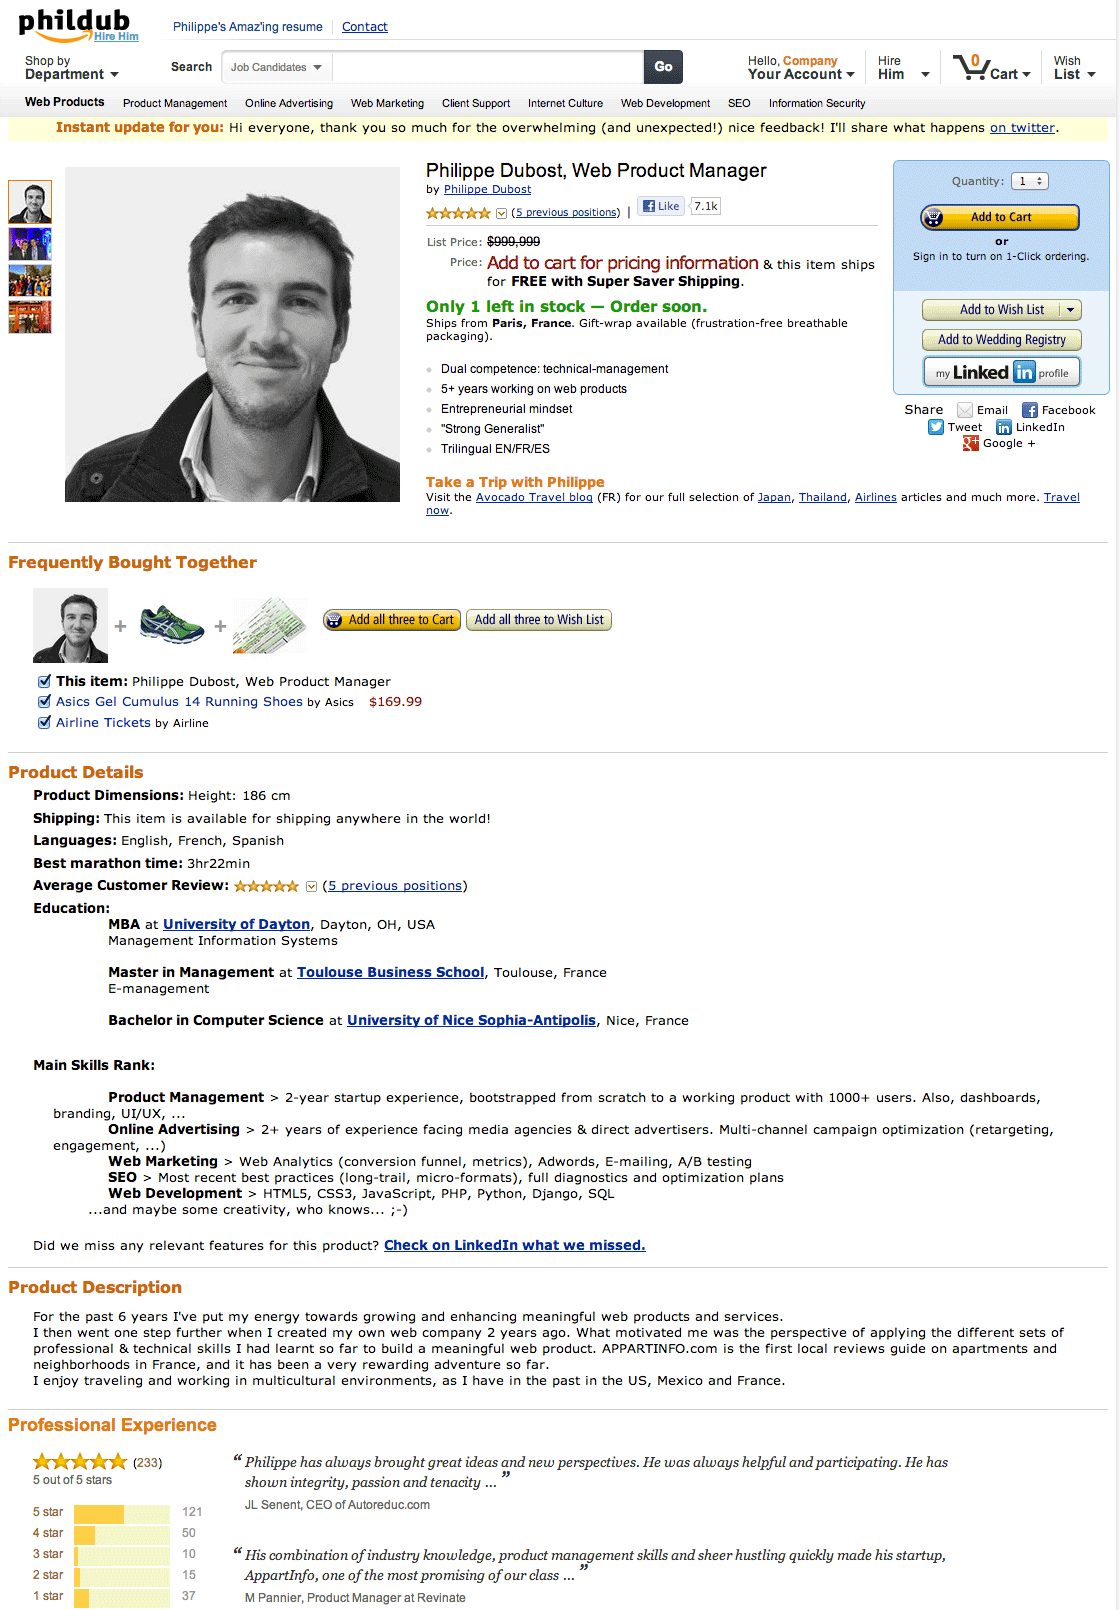 Incredible Amazon Page Resumé